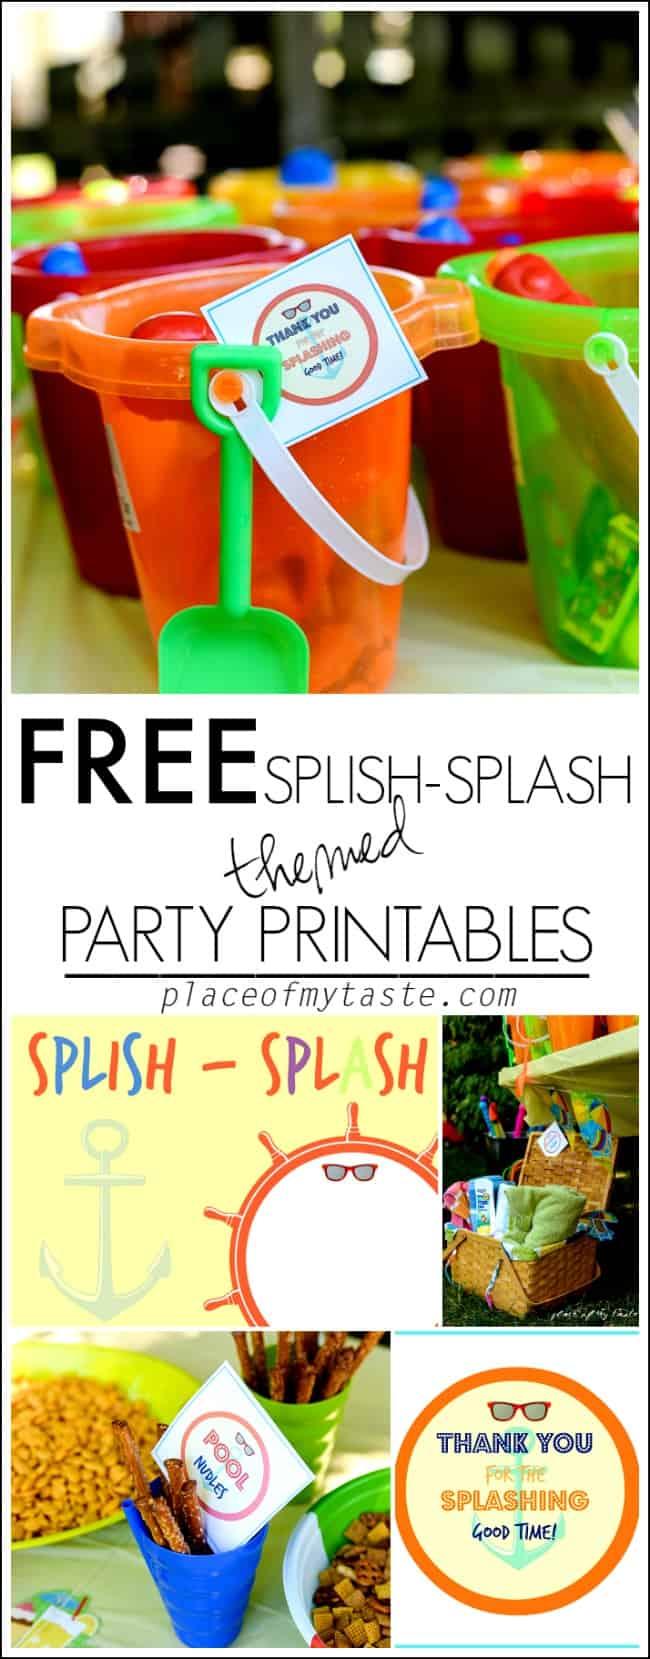 FREE SPLISH SPLASH THEMED PARTY PRINTABLES